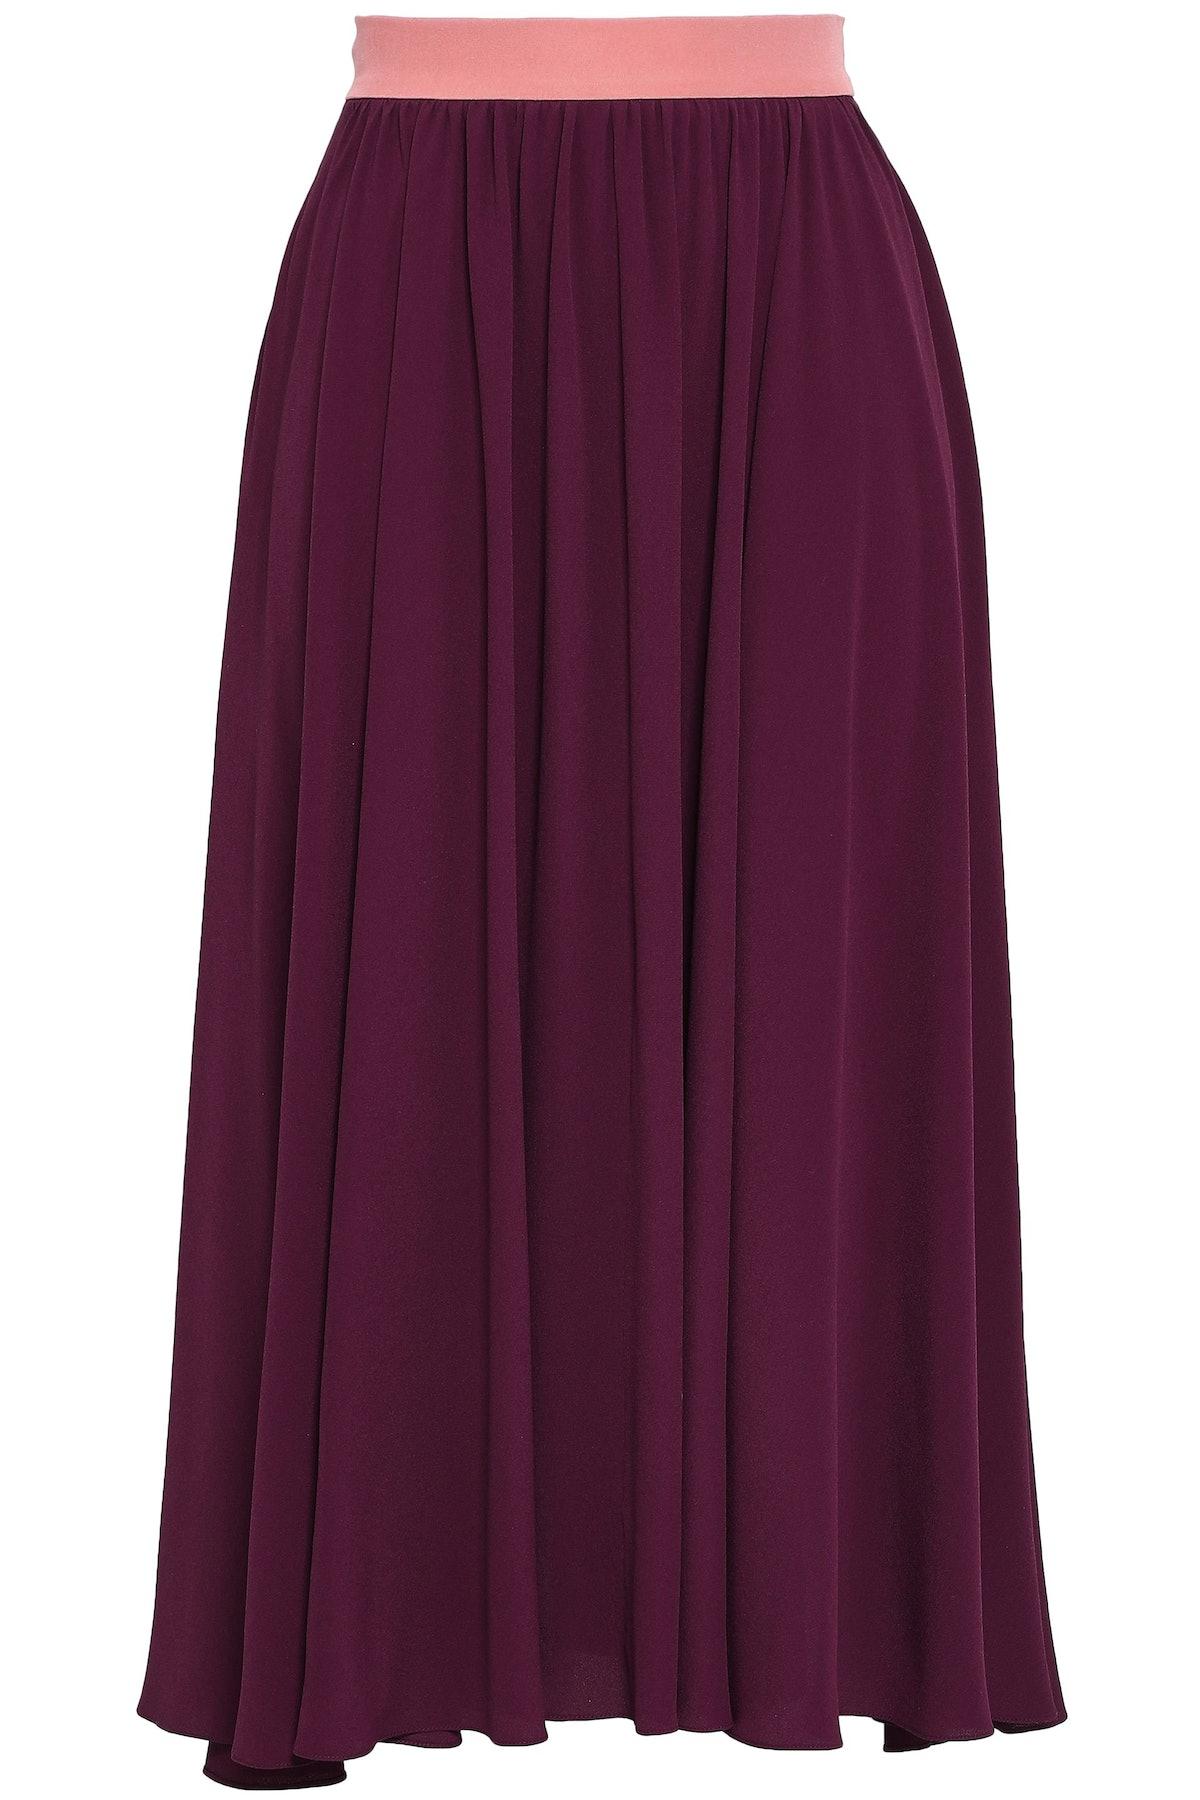 Roksanda Gathered Crepe Midi Skirt